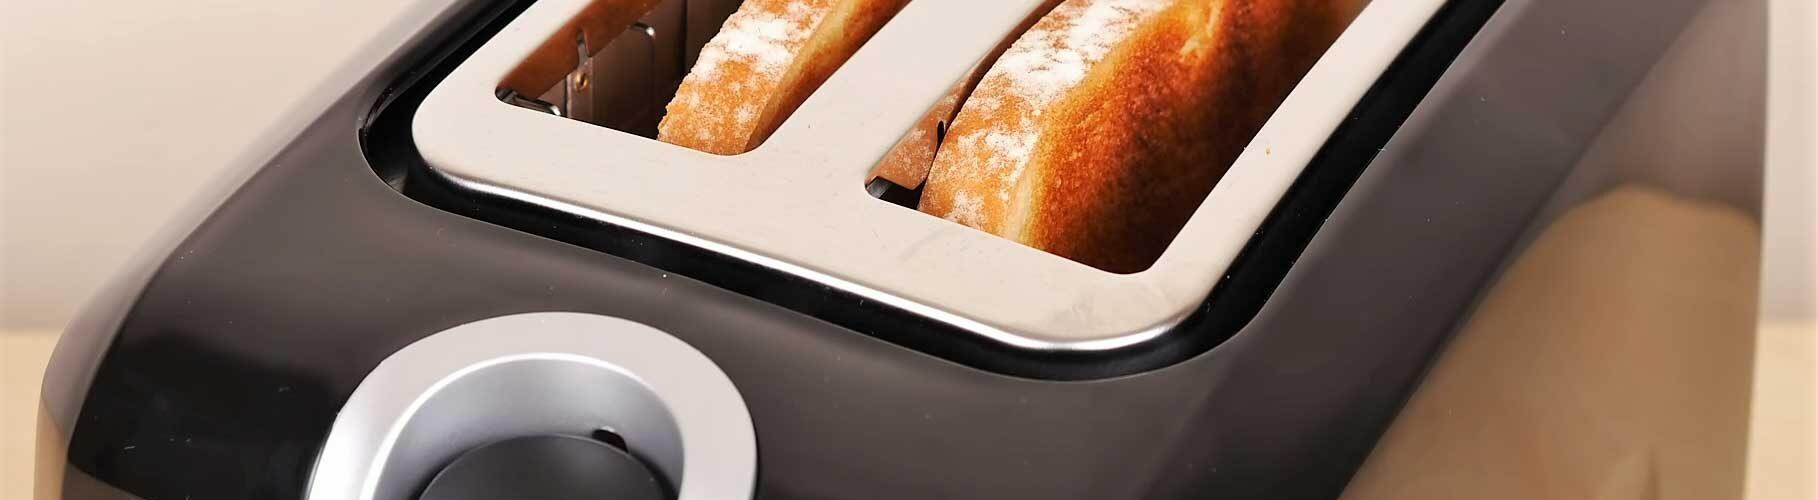 Best slim toaster